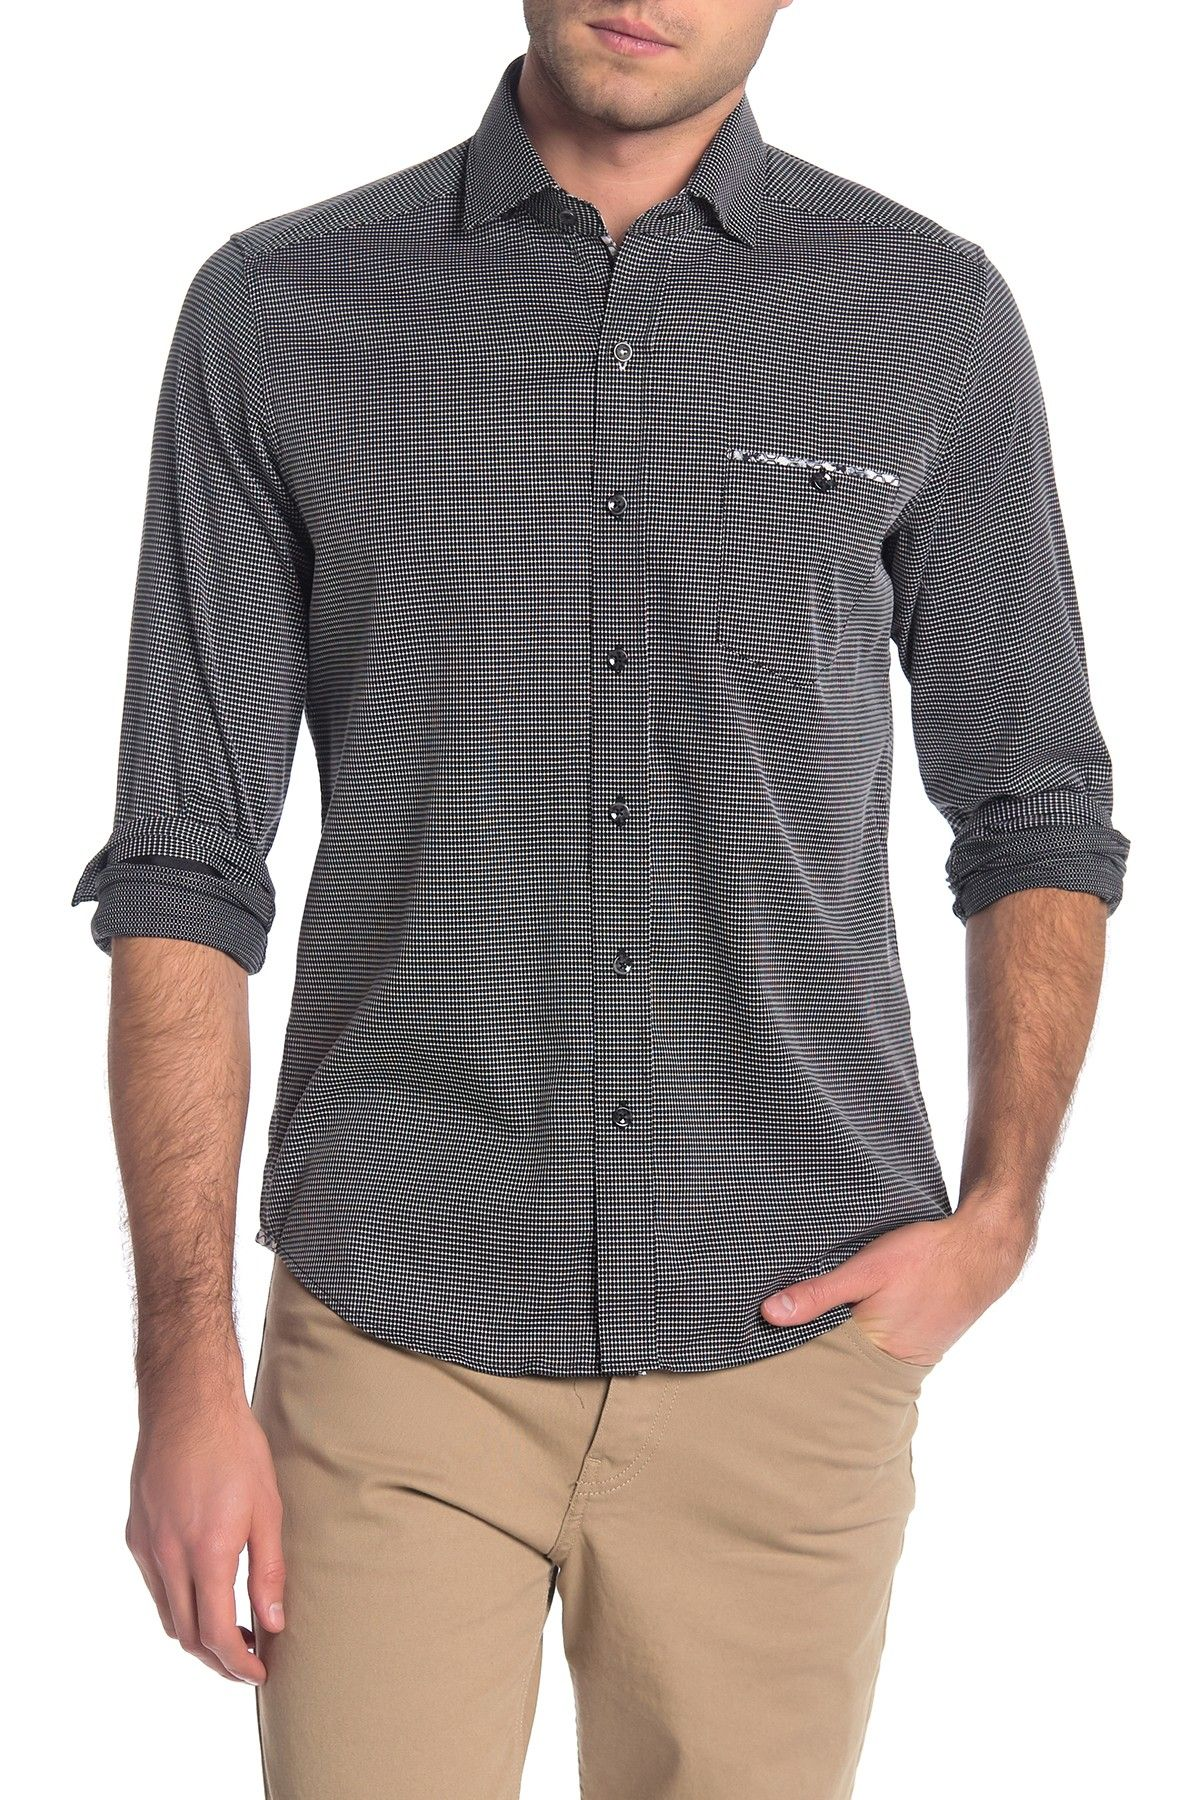 Robert Graham  Kareen Long Sleeve Tailored Fit Shirt in 7